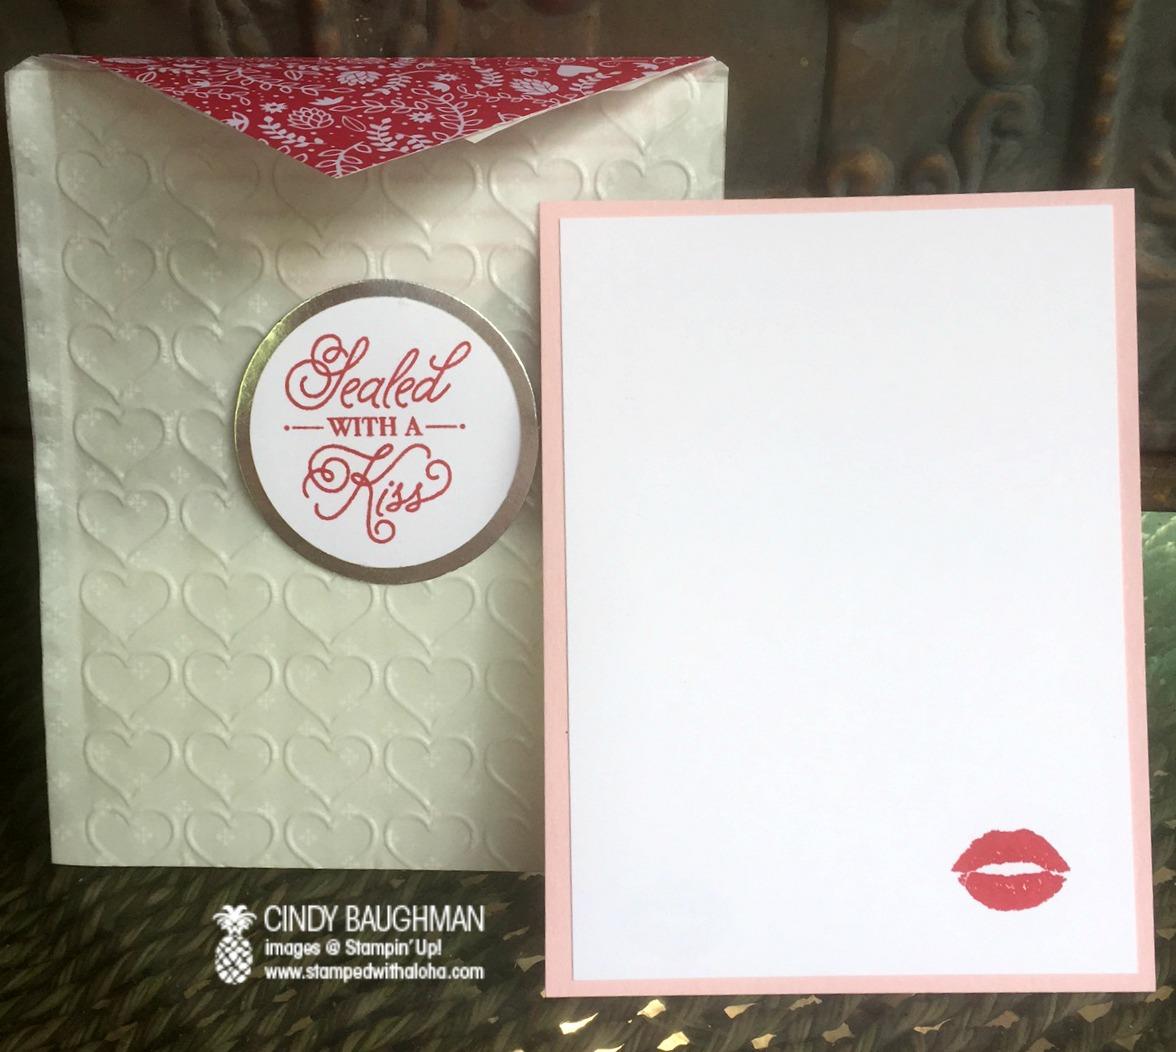 Sealed With A Kiss Pocket Card - www.stampedwithaloha.com